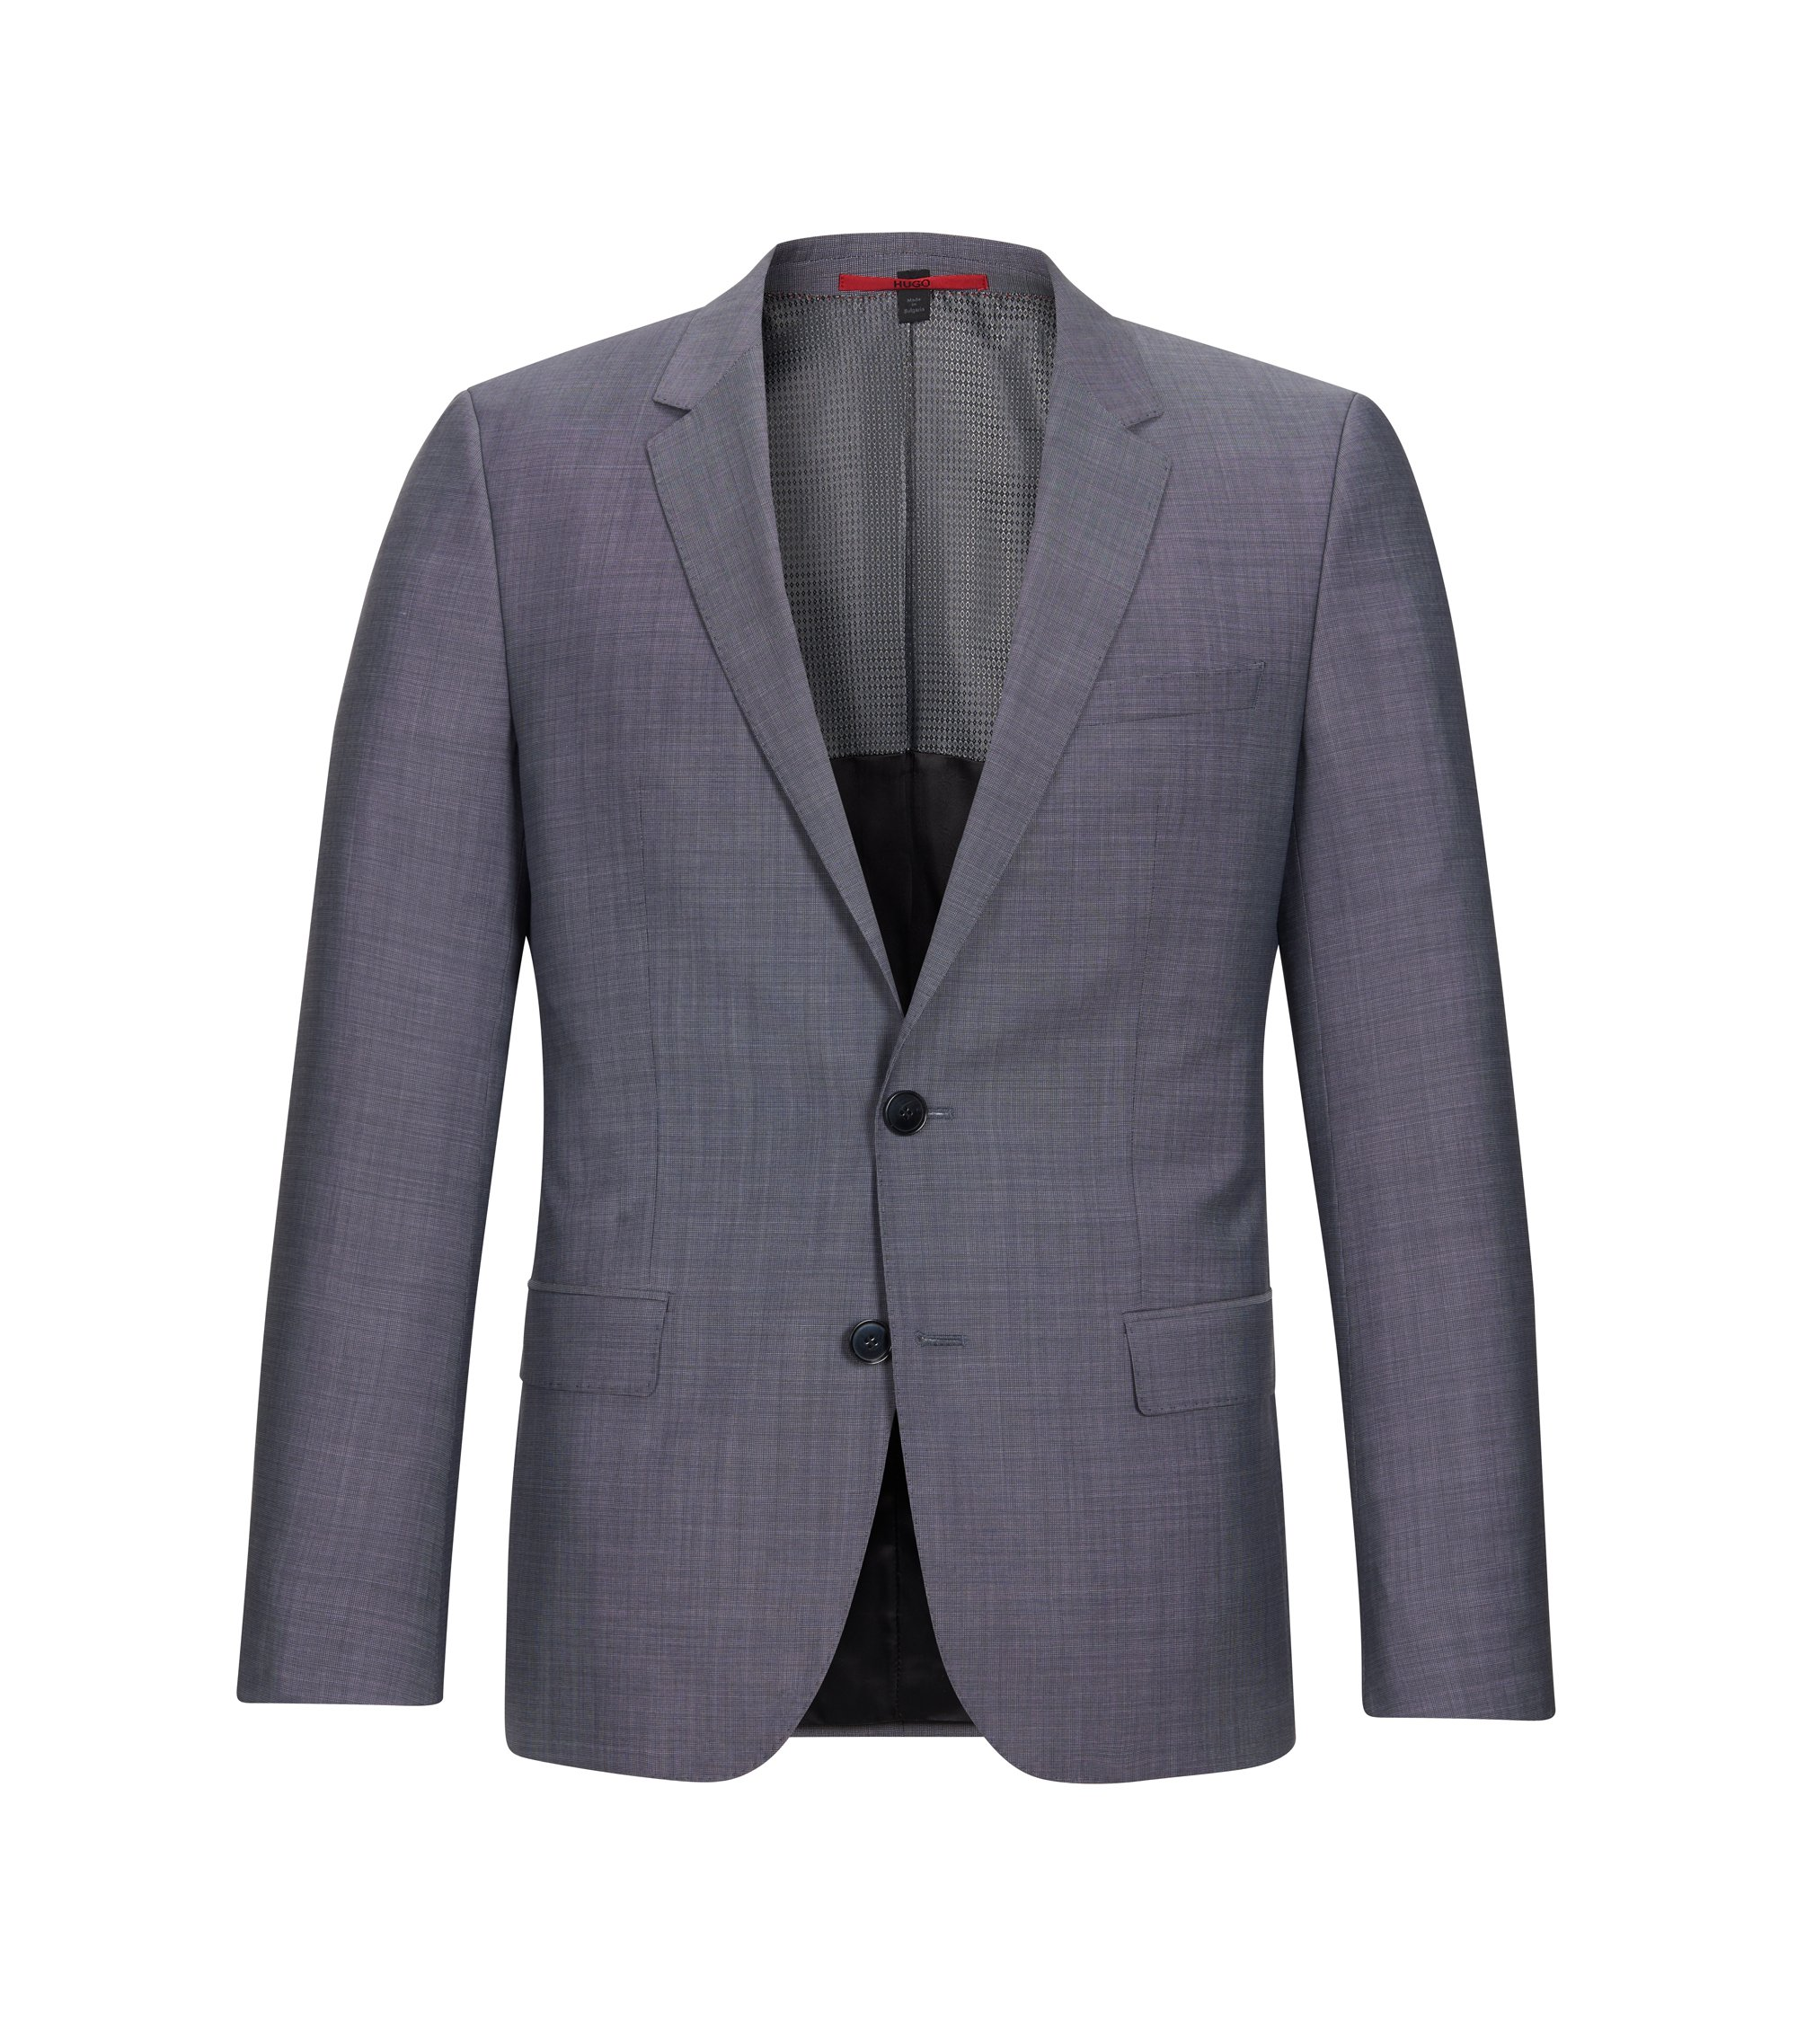 Italian Virgin Wool Sport Coat, Slim Fit   C-Huge, Open Grey